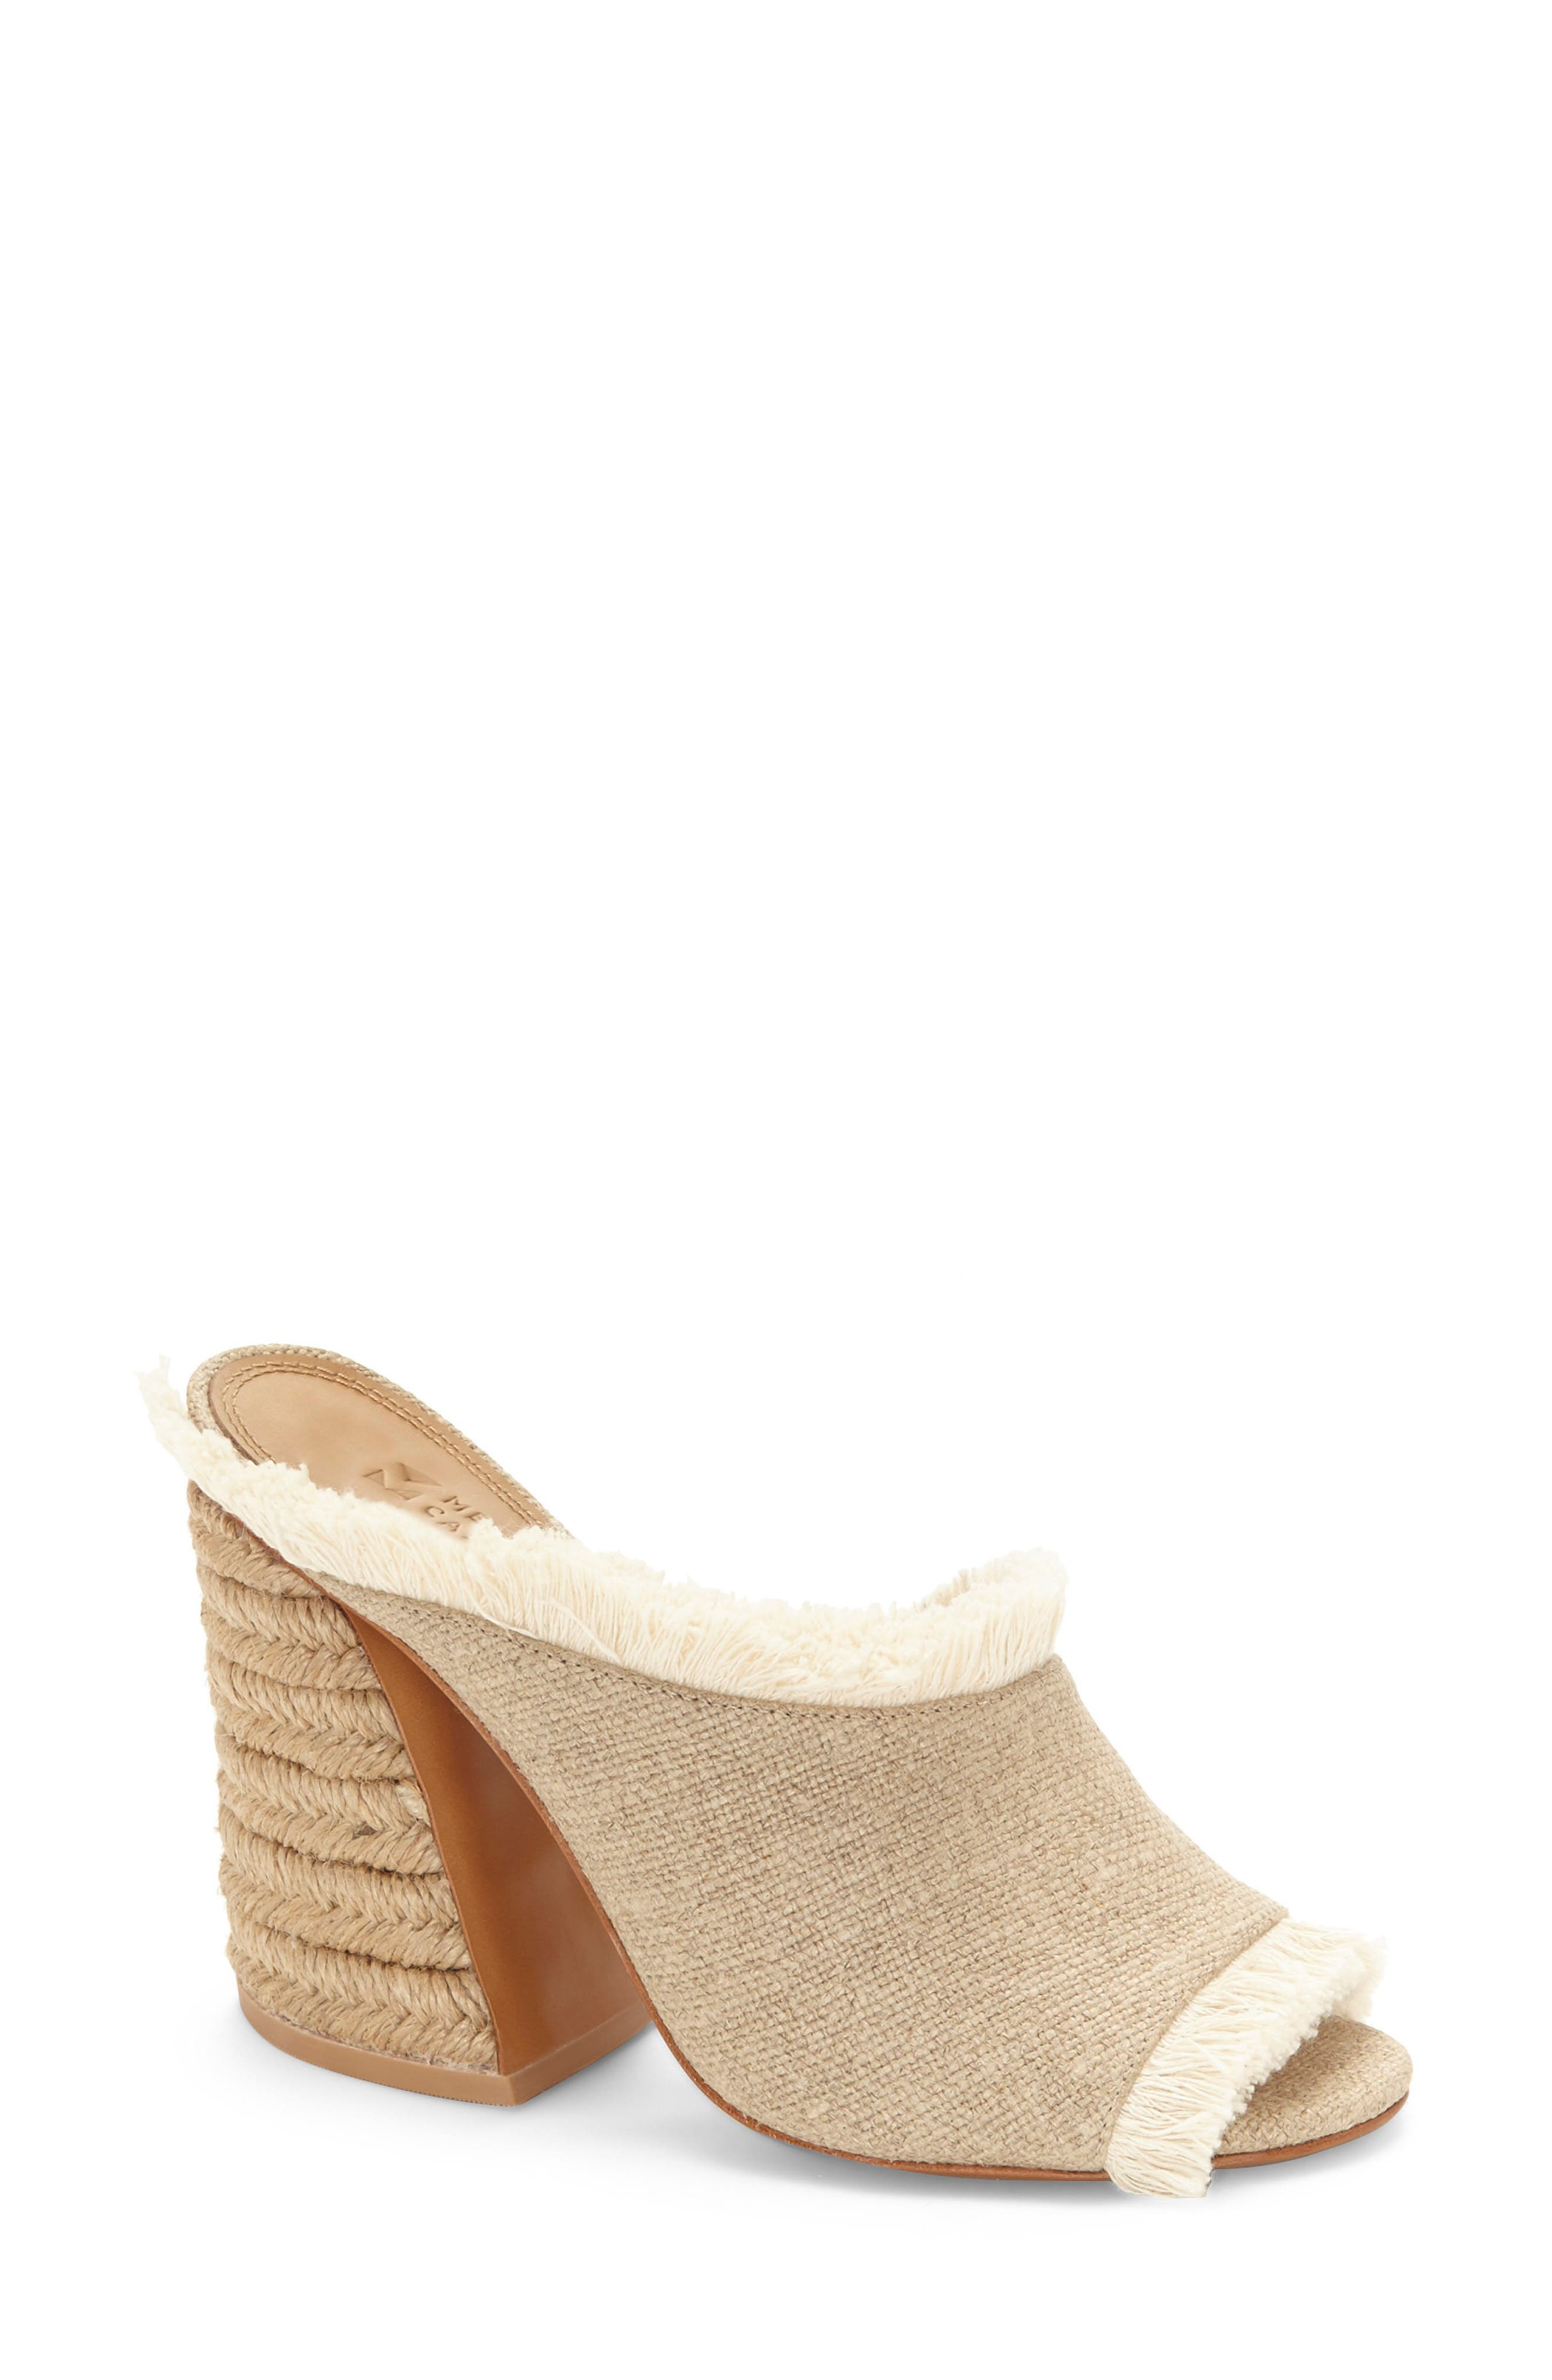 Izar Fringe Asymmetrical Sandal,                         Main,                         color, 250